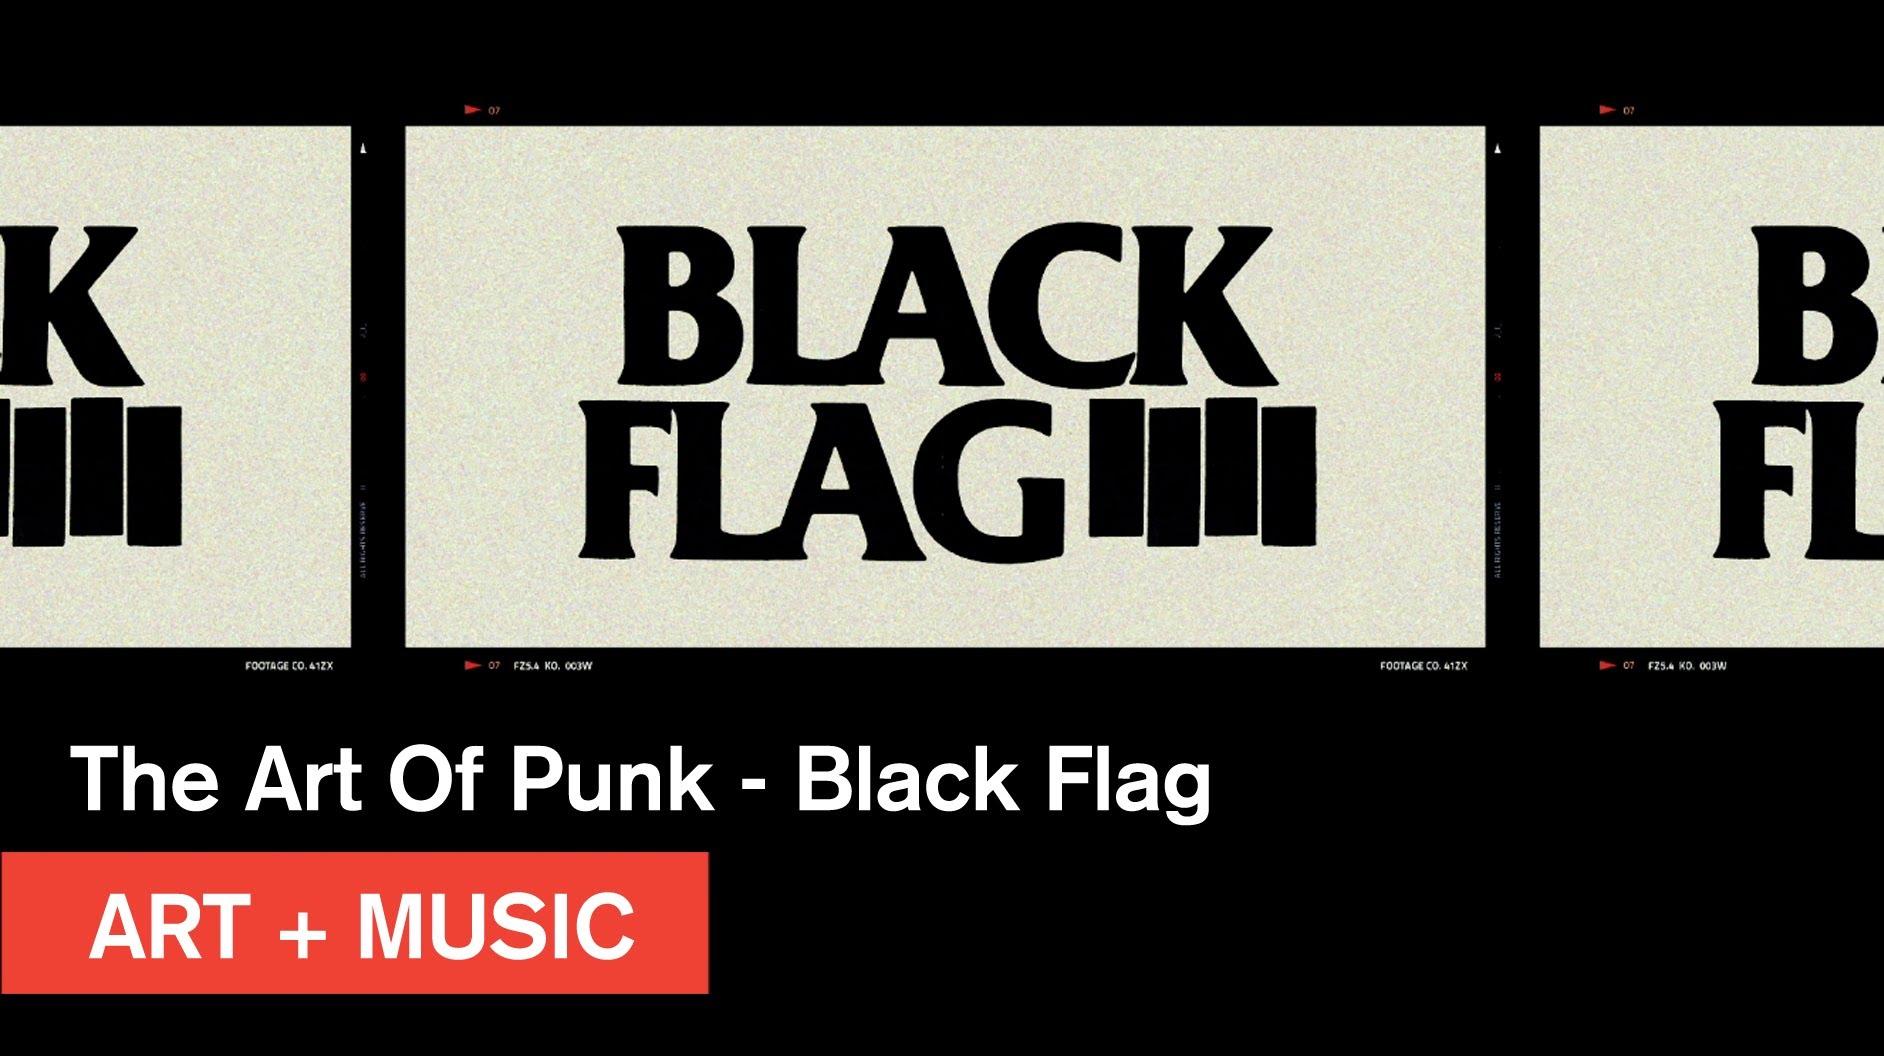 The Art of Punk, Documentary Short Looks at the Art of Hardcore Punk Band Black Flag